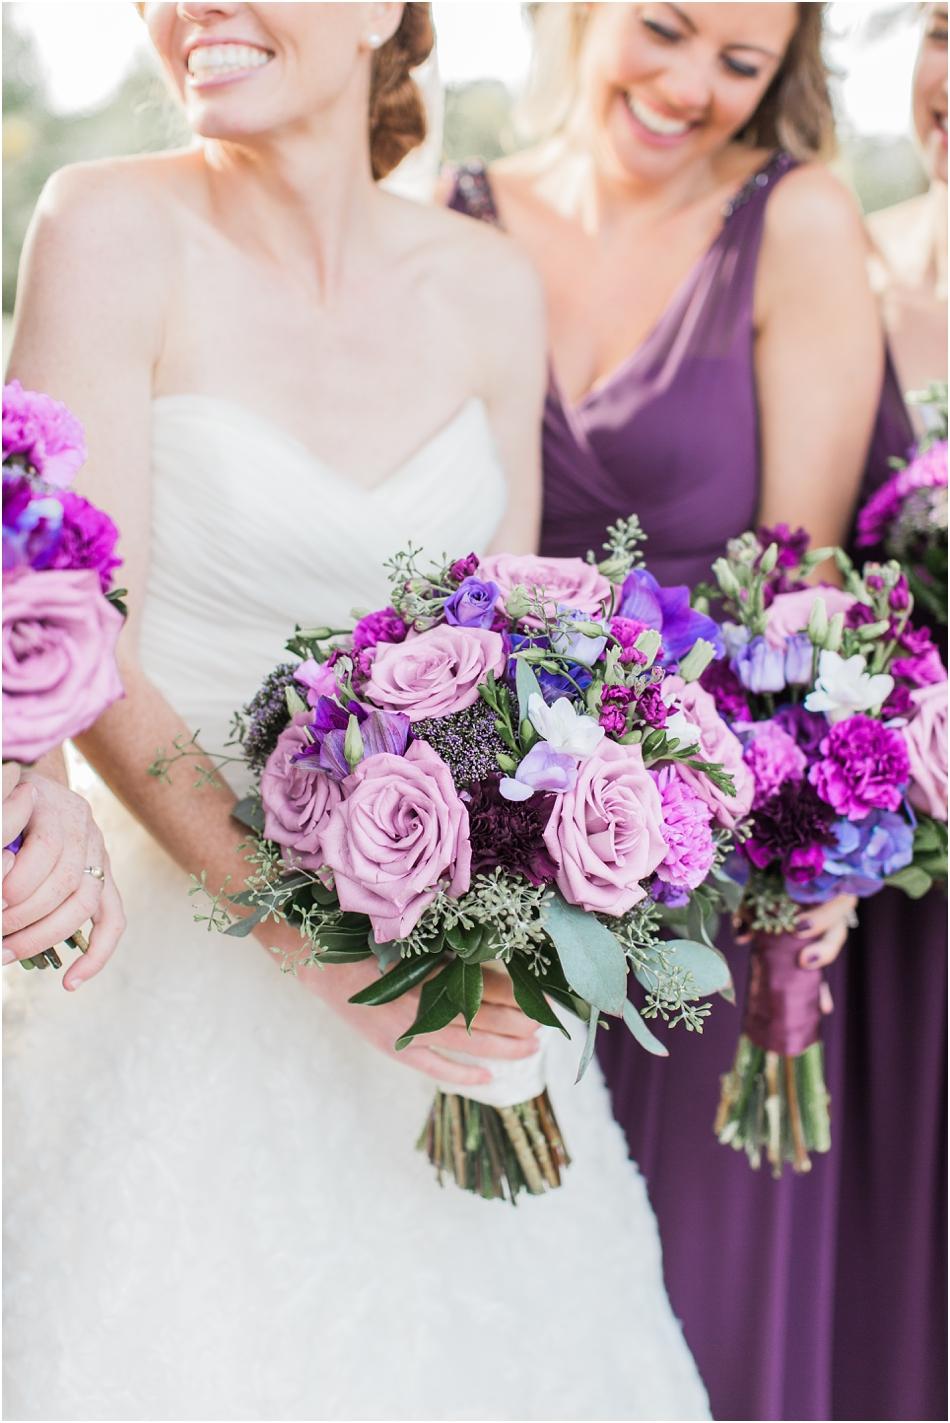 willowbend_megan_david_country_club_cape_cod_boston_new_england_wedding_photographer_Meredith_Jane_Photography_photo_0197.jpg